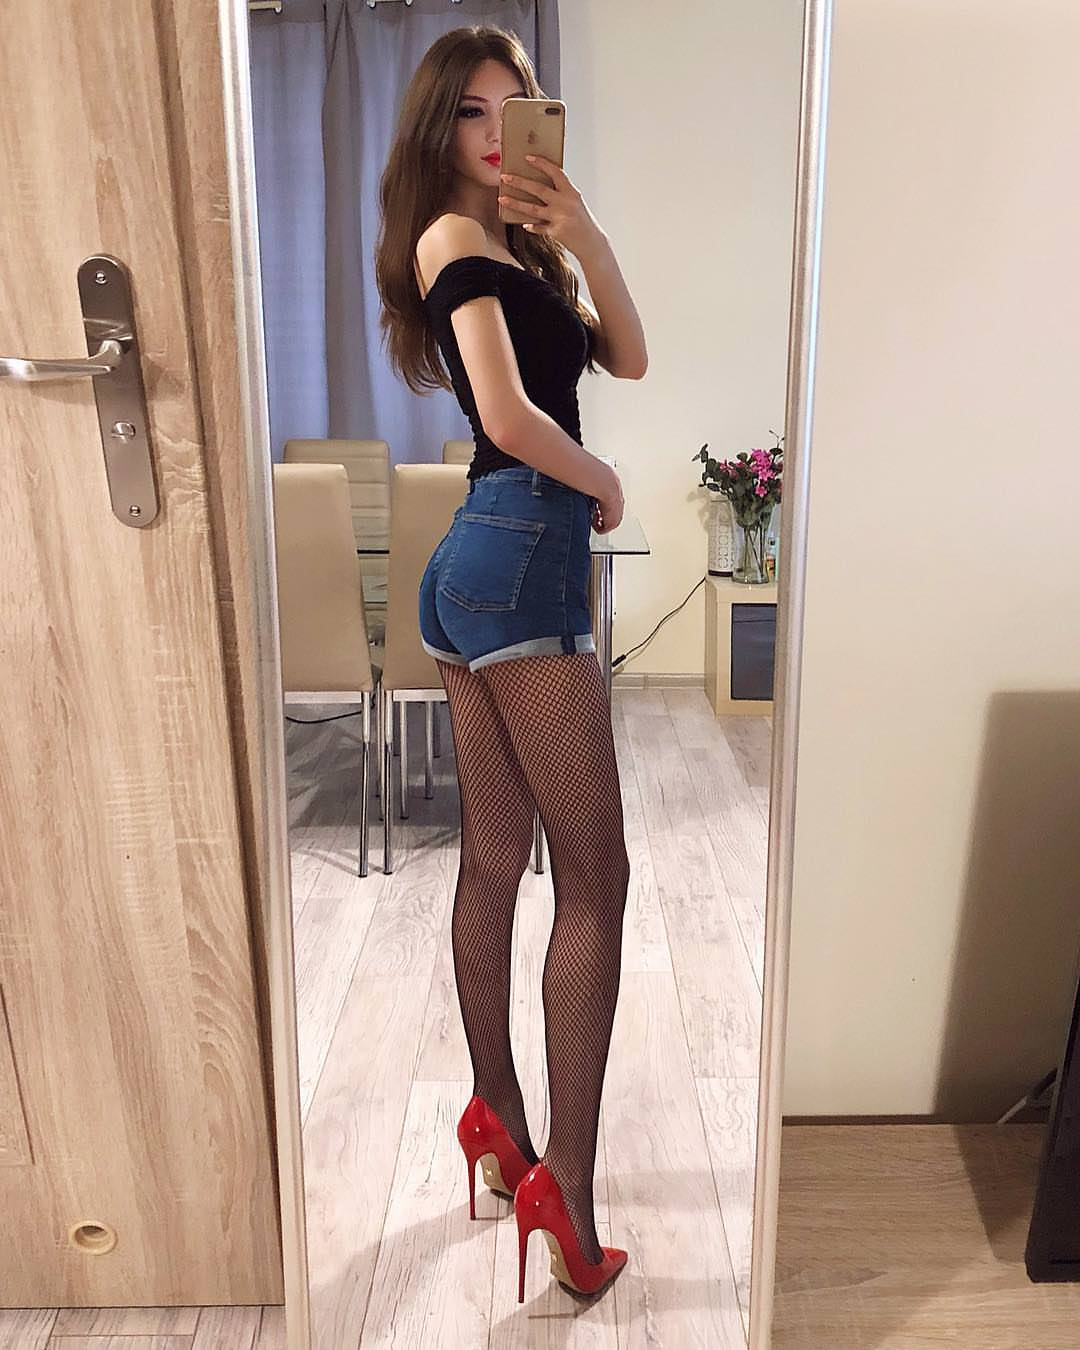 Asian Insert Heels Porn long legs and high heels porn pic - eporner